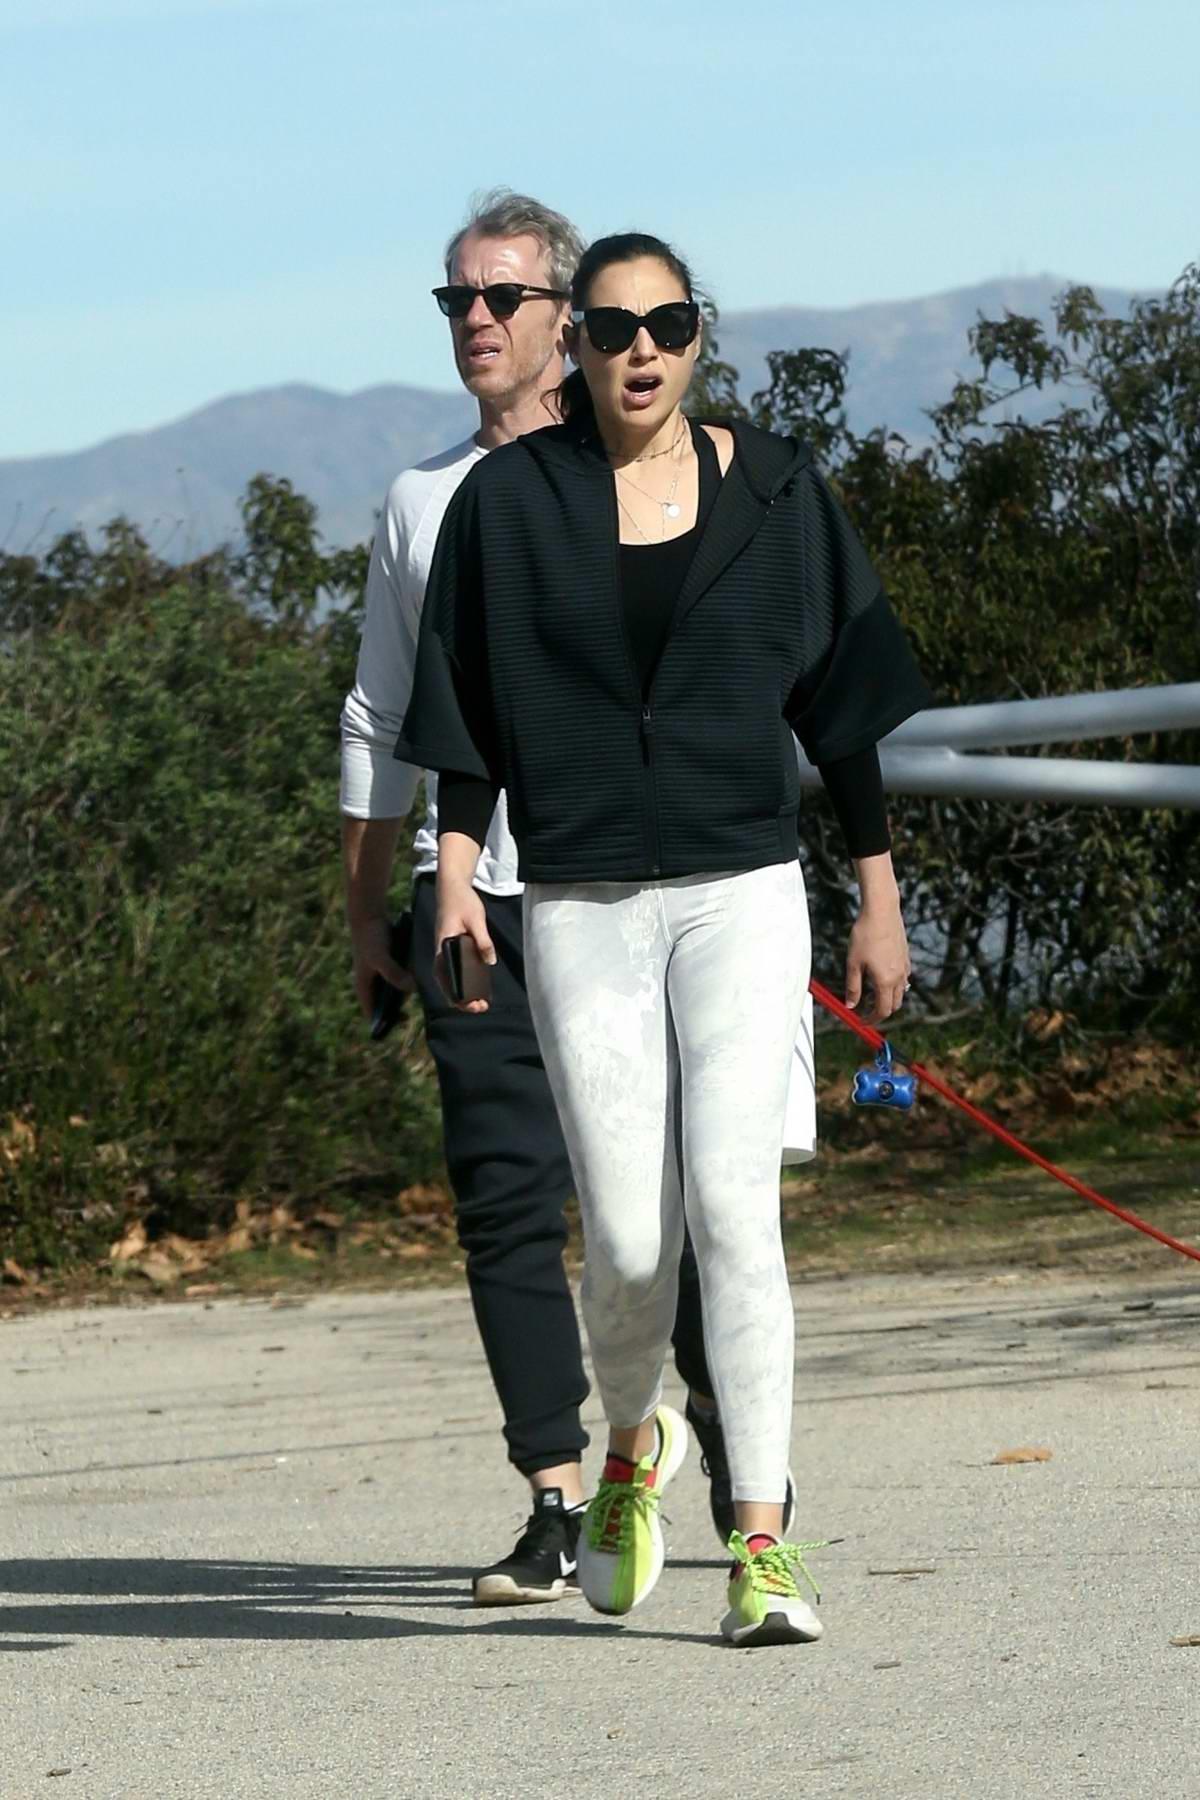 Gal Gadot and husband Yaron Varsano enjoy a hike with their dog in Los Angeles